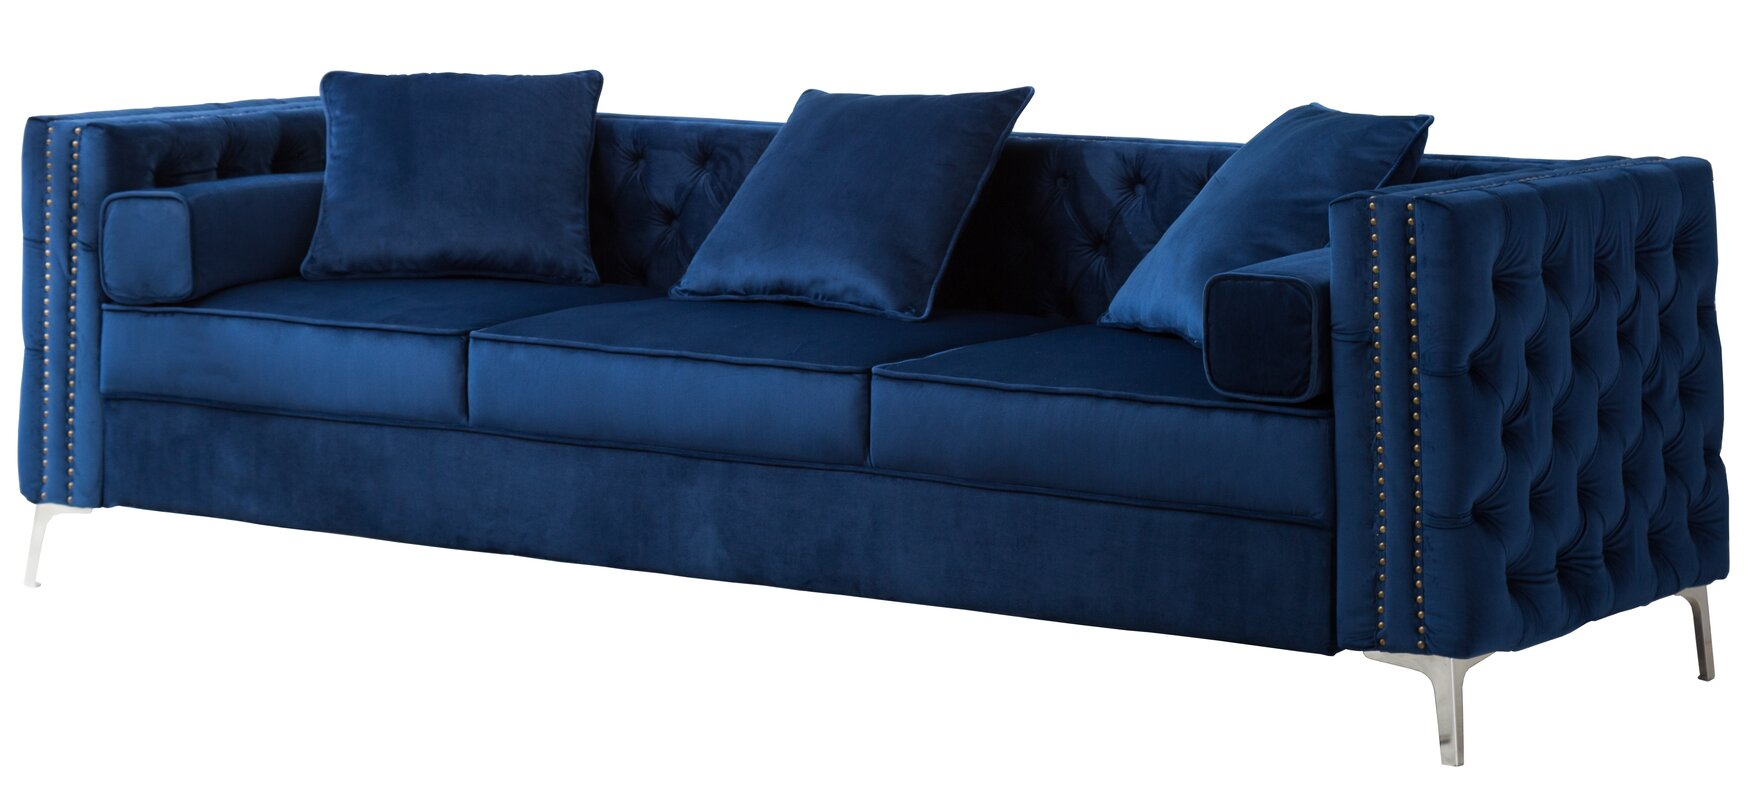 Legand Marchan Sofa   Item# 12355